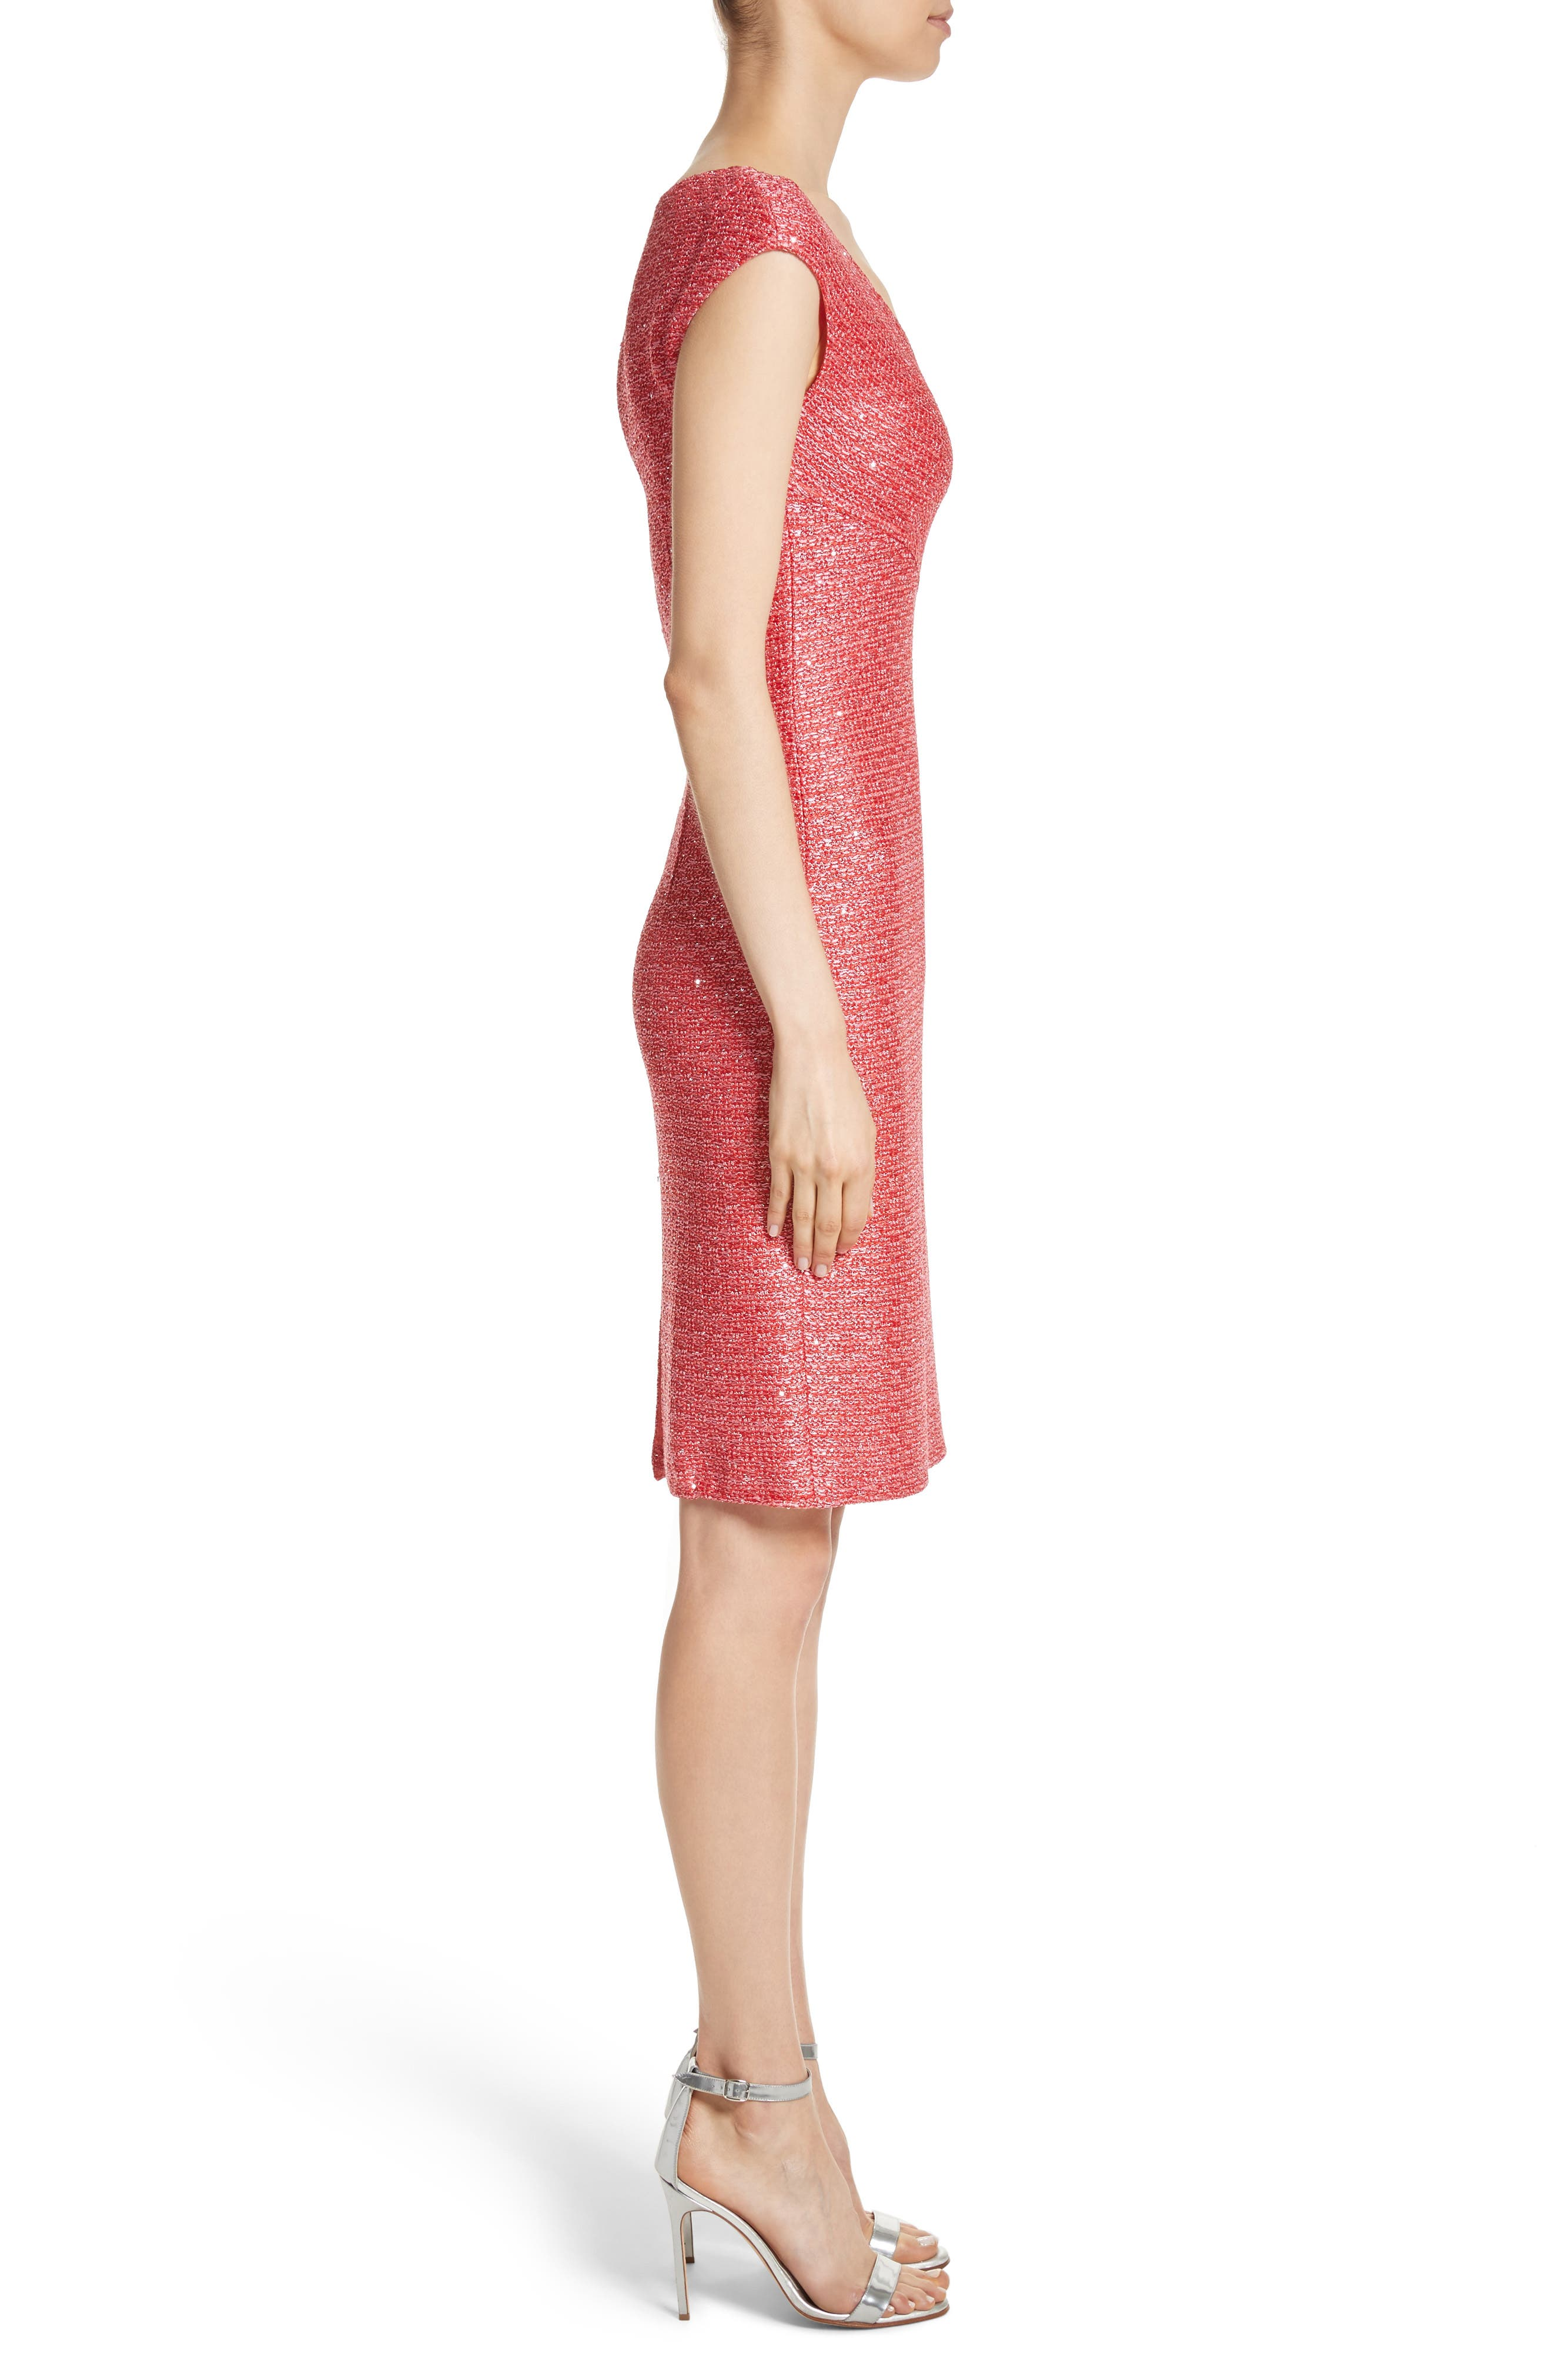 Hansh Knit Dress,                             Alternate thumbnail 3, color,                             950